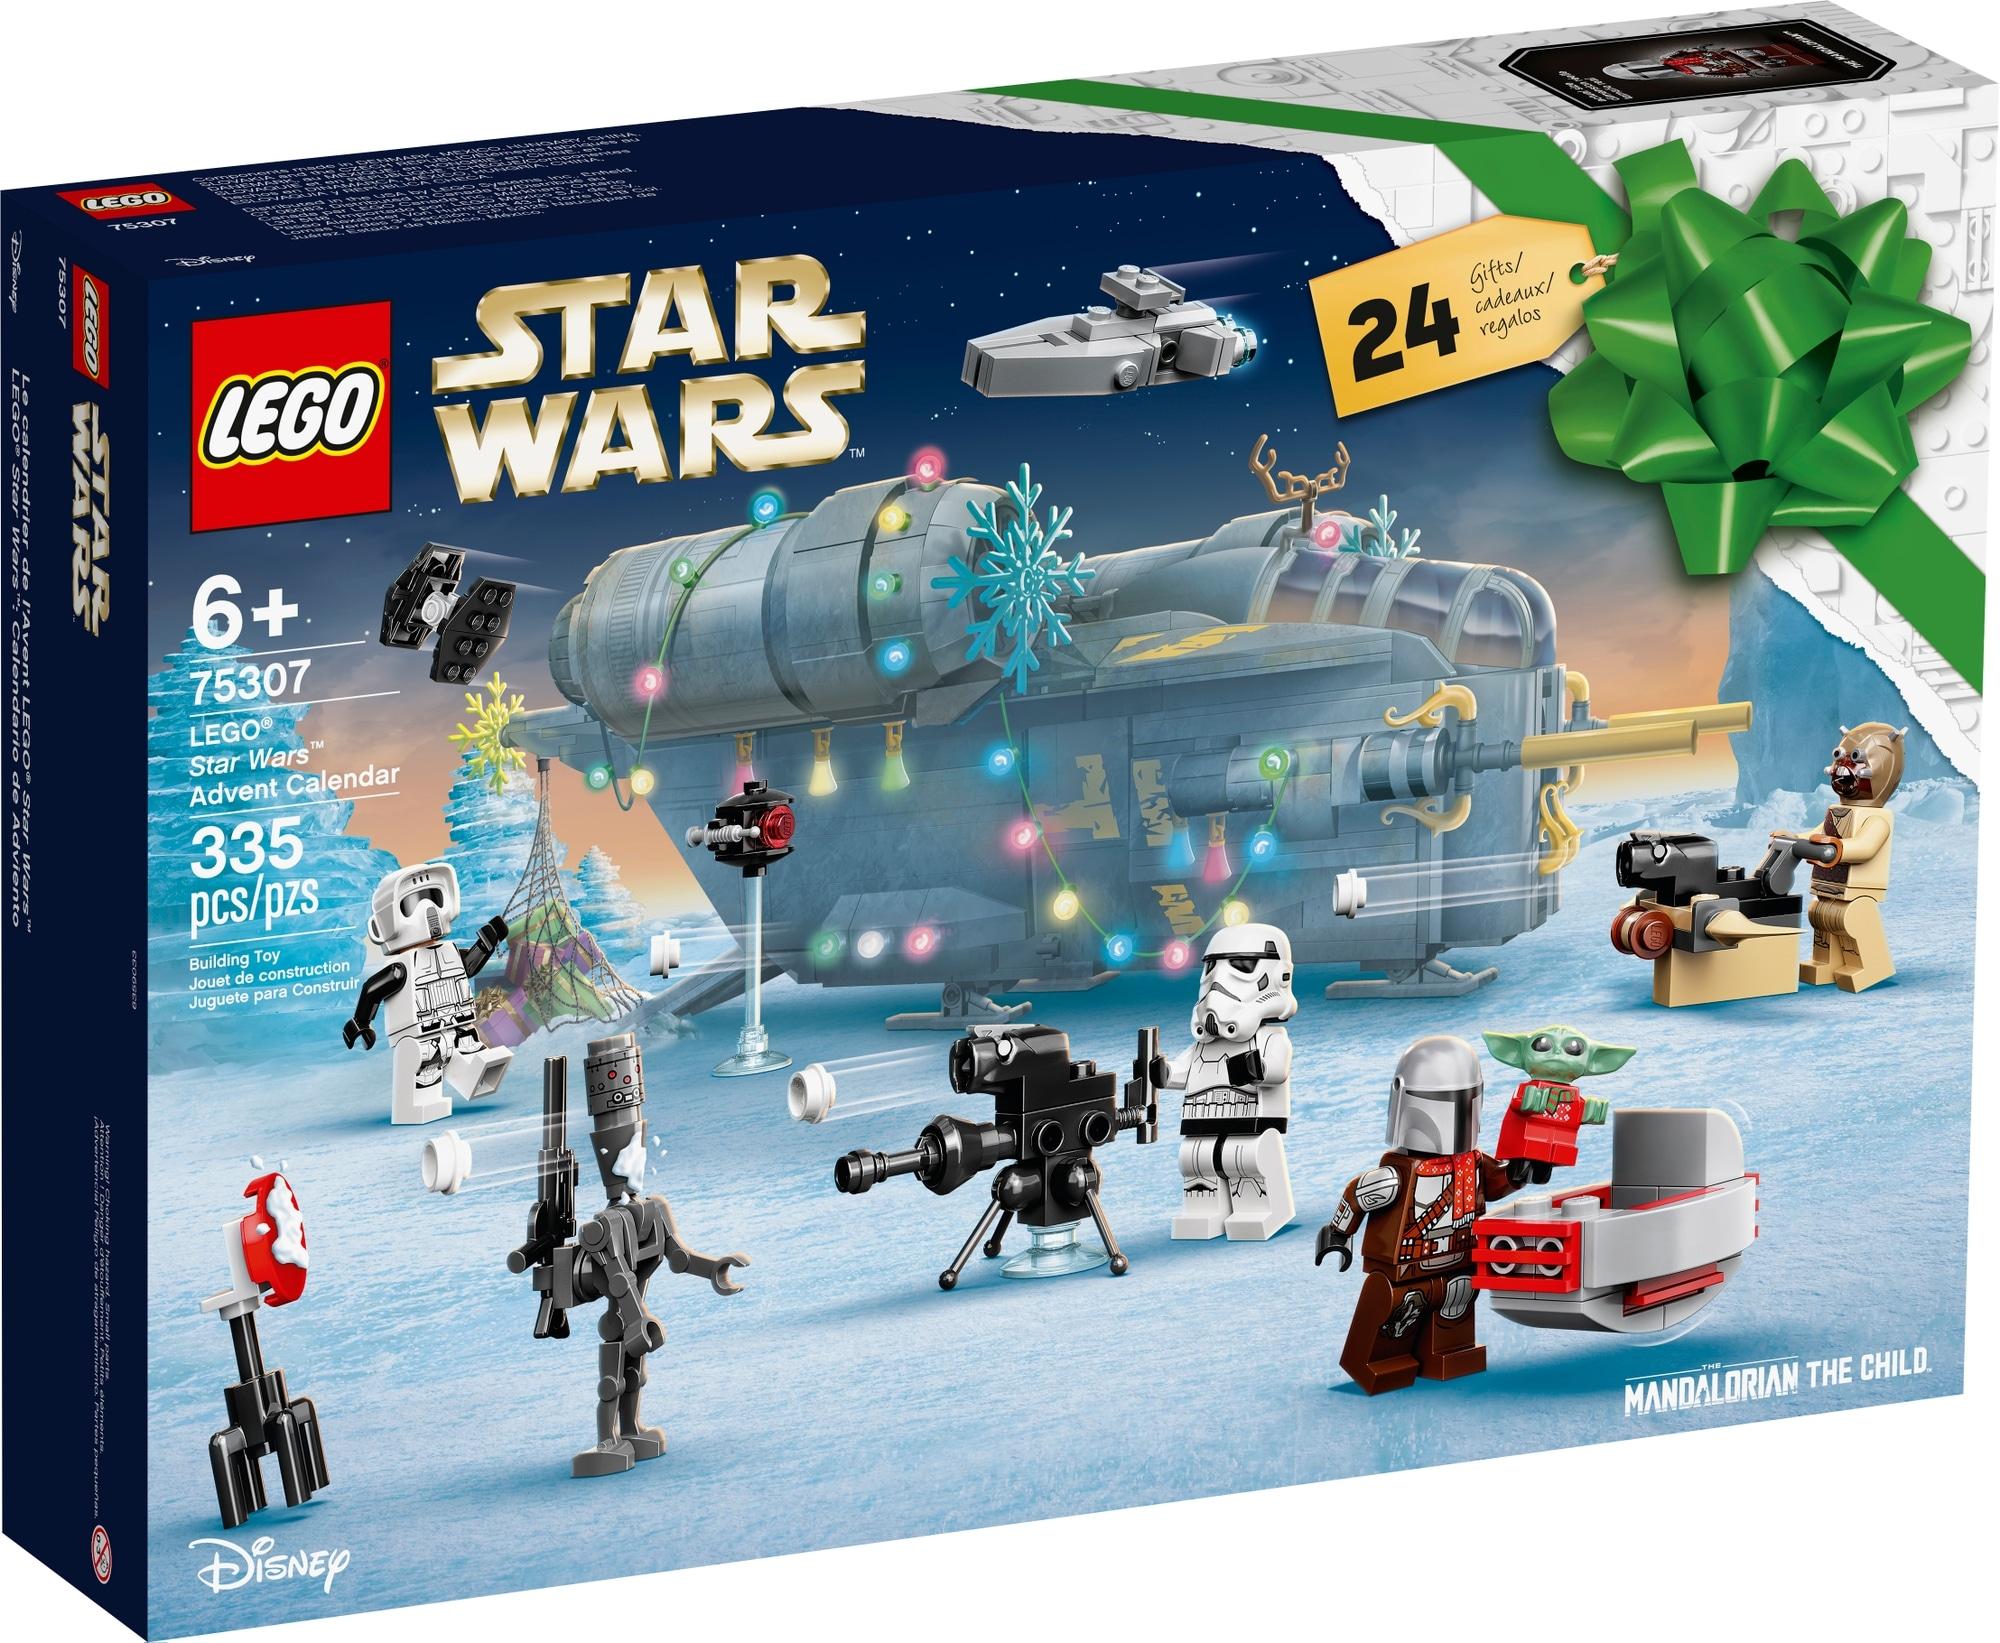 LEGO 75307 LEGO Star Wars Adventskalender 2021 1